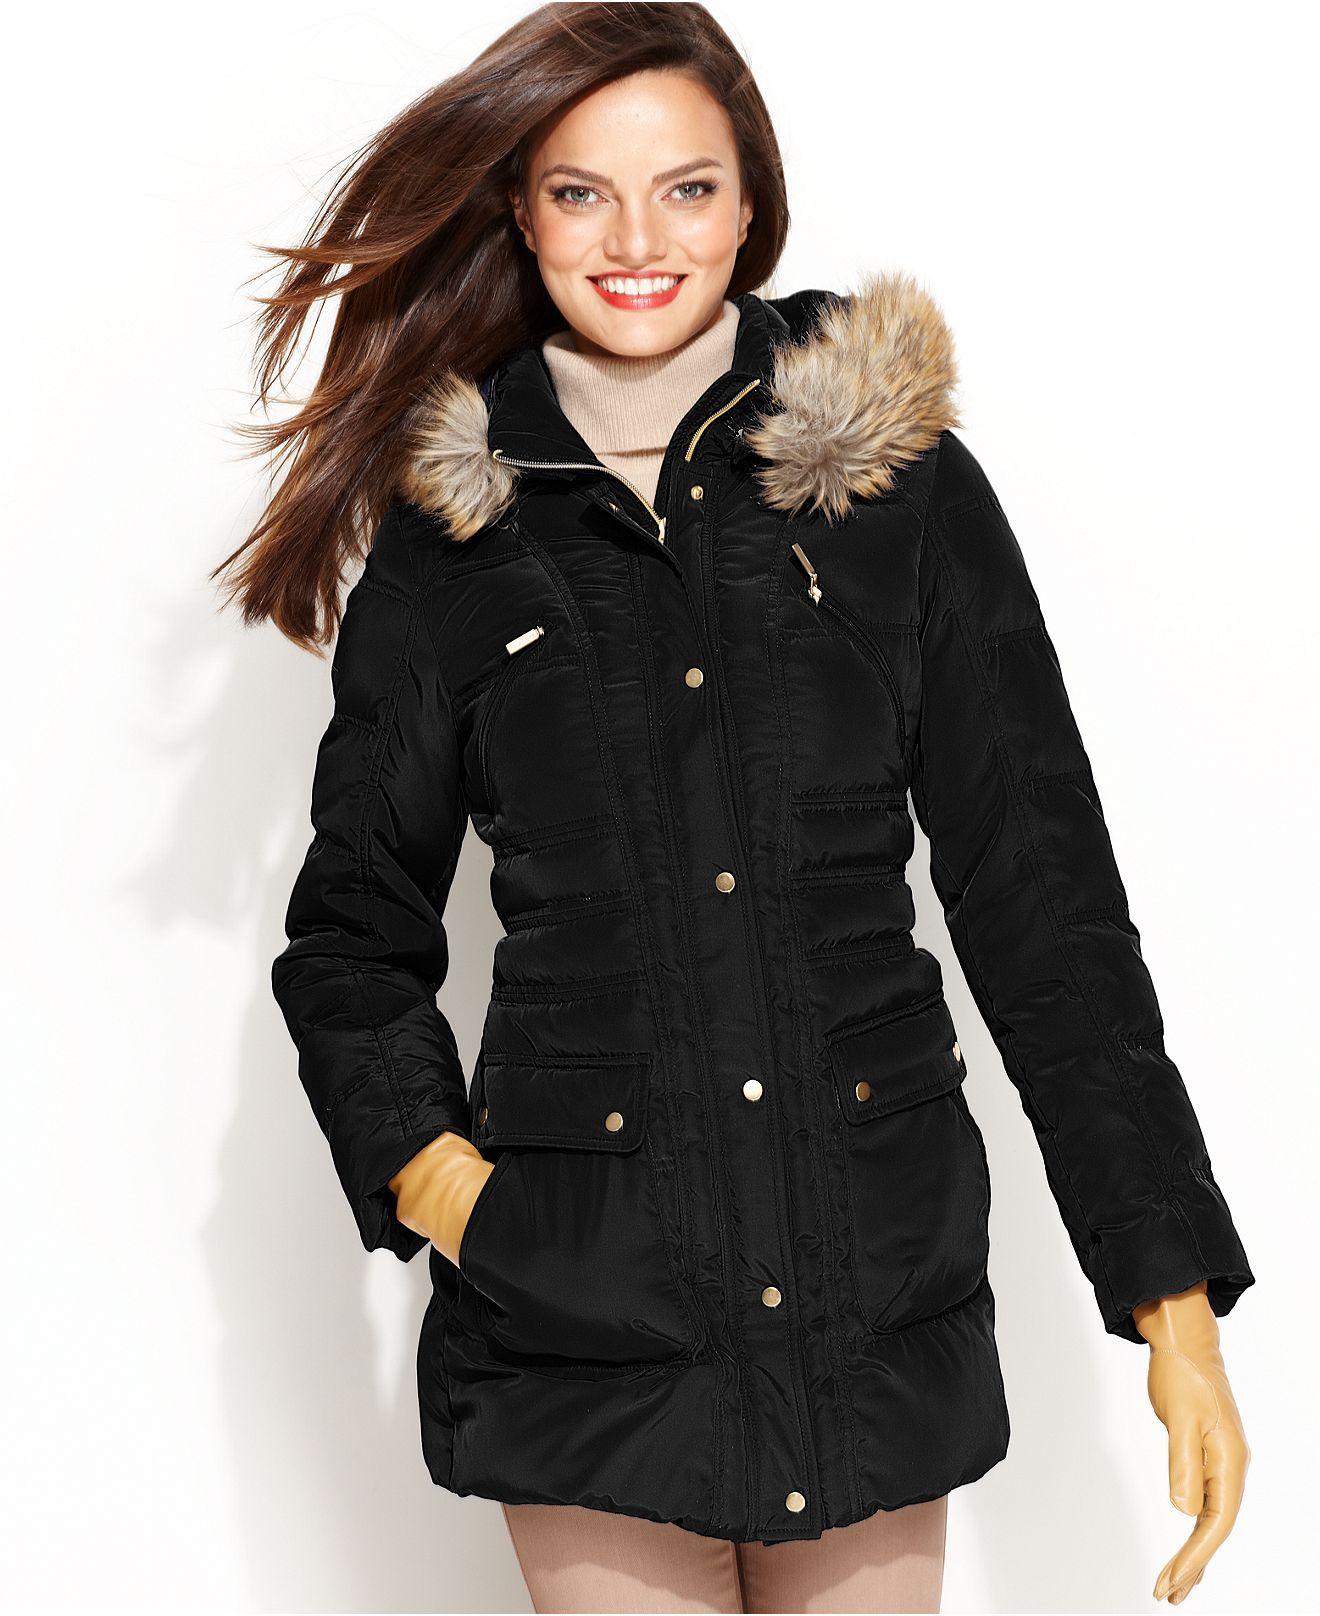 Jones New York Coat, Faux-Fur Hooded Utility Puffer